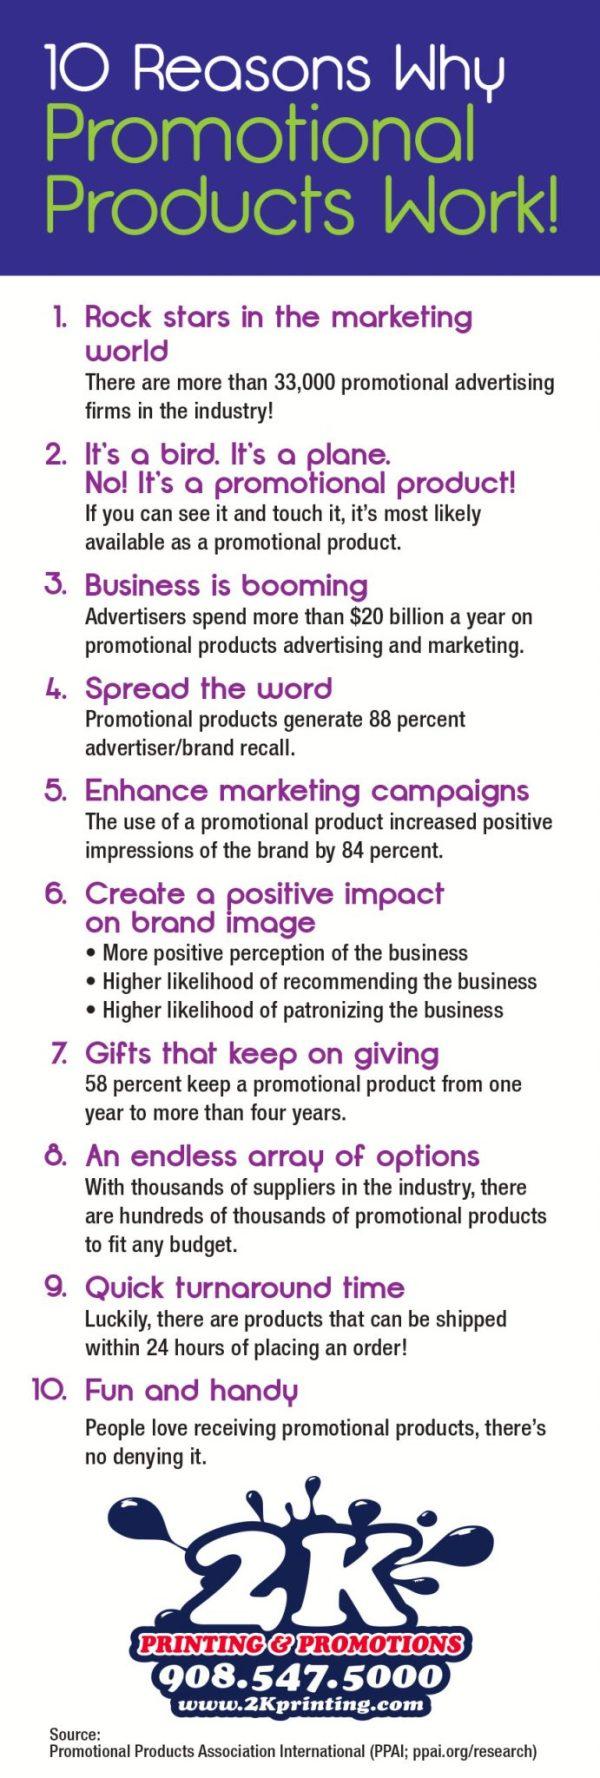 2KPrinting-Advertising-and-Promotios-10-Reasons